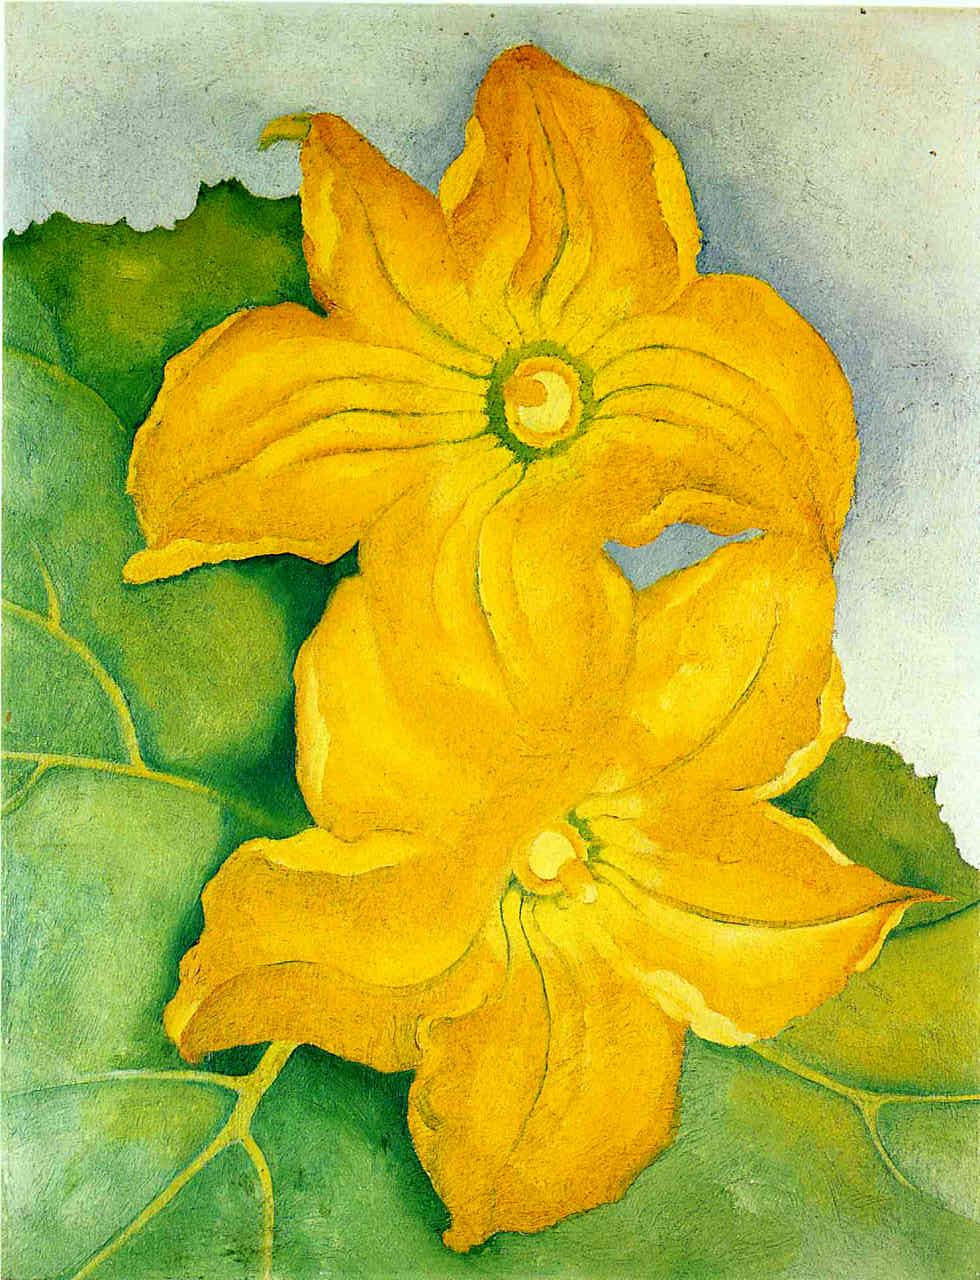 Squash Blossoms I, Georgia O'Keeffe, 1925.